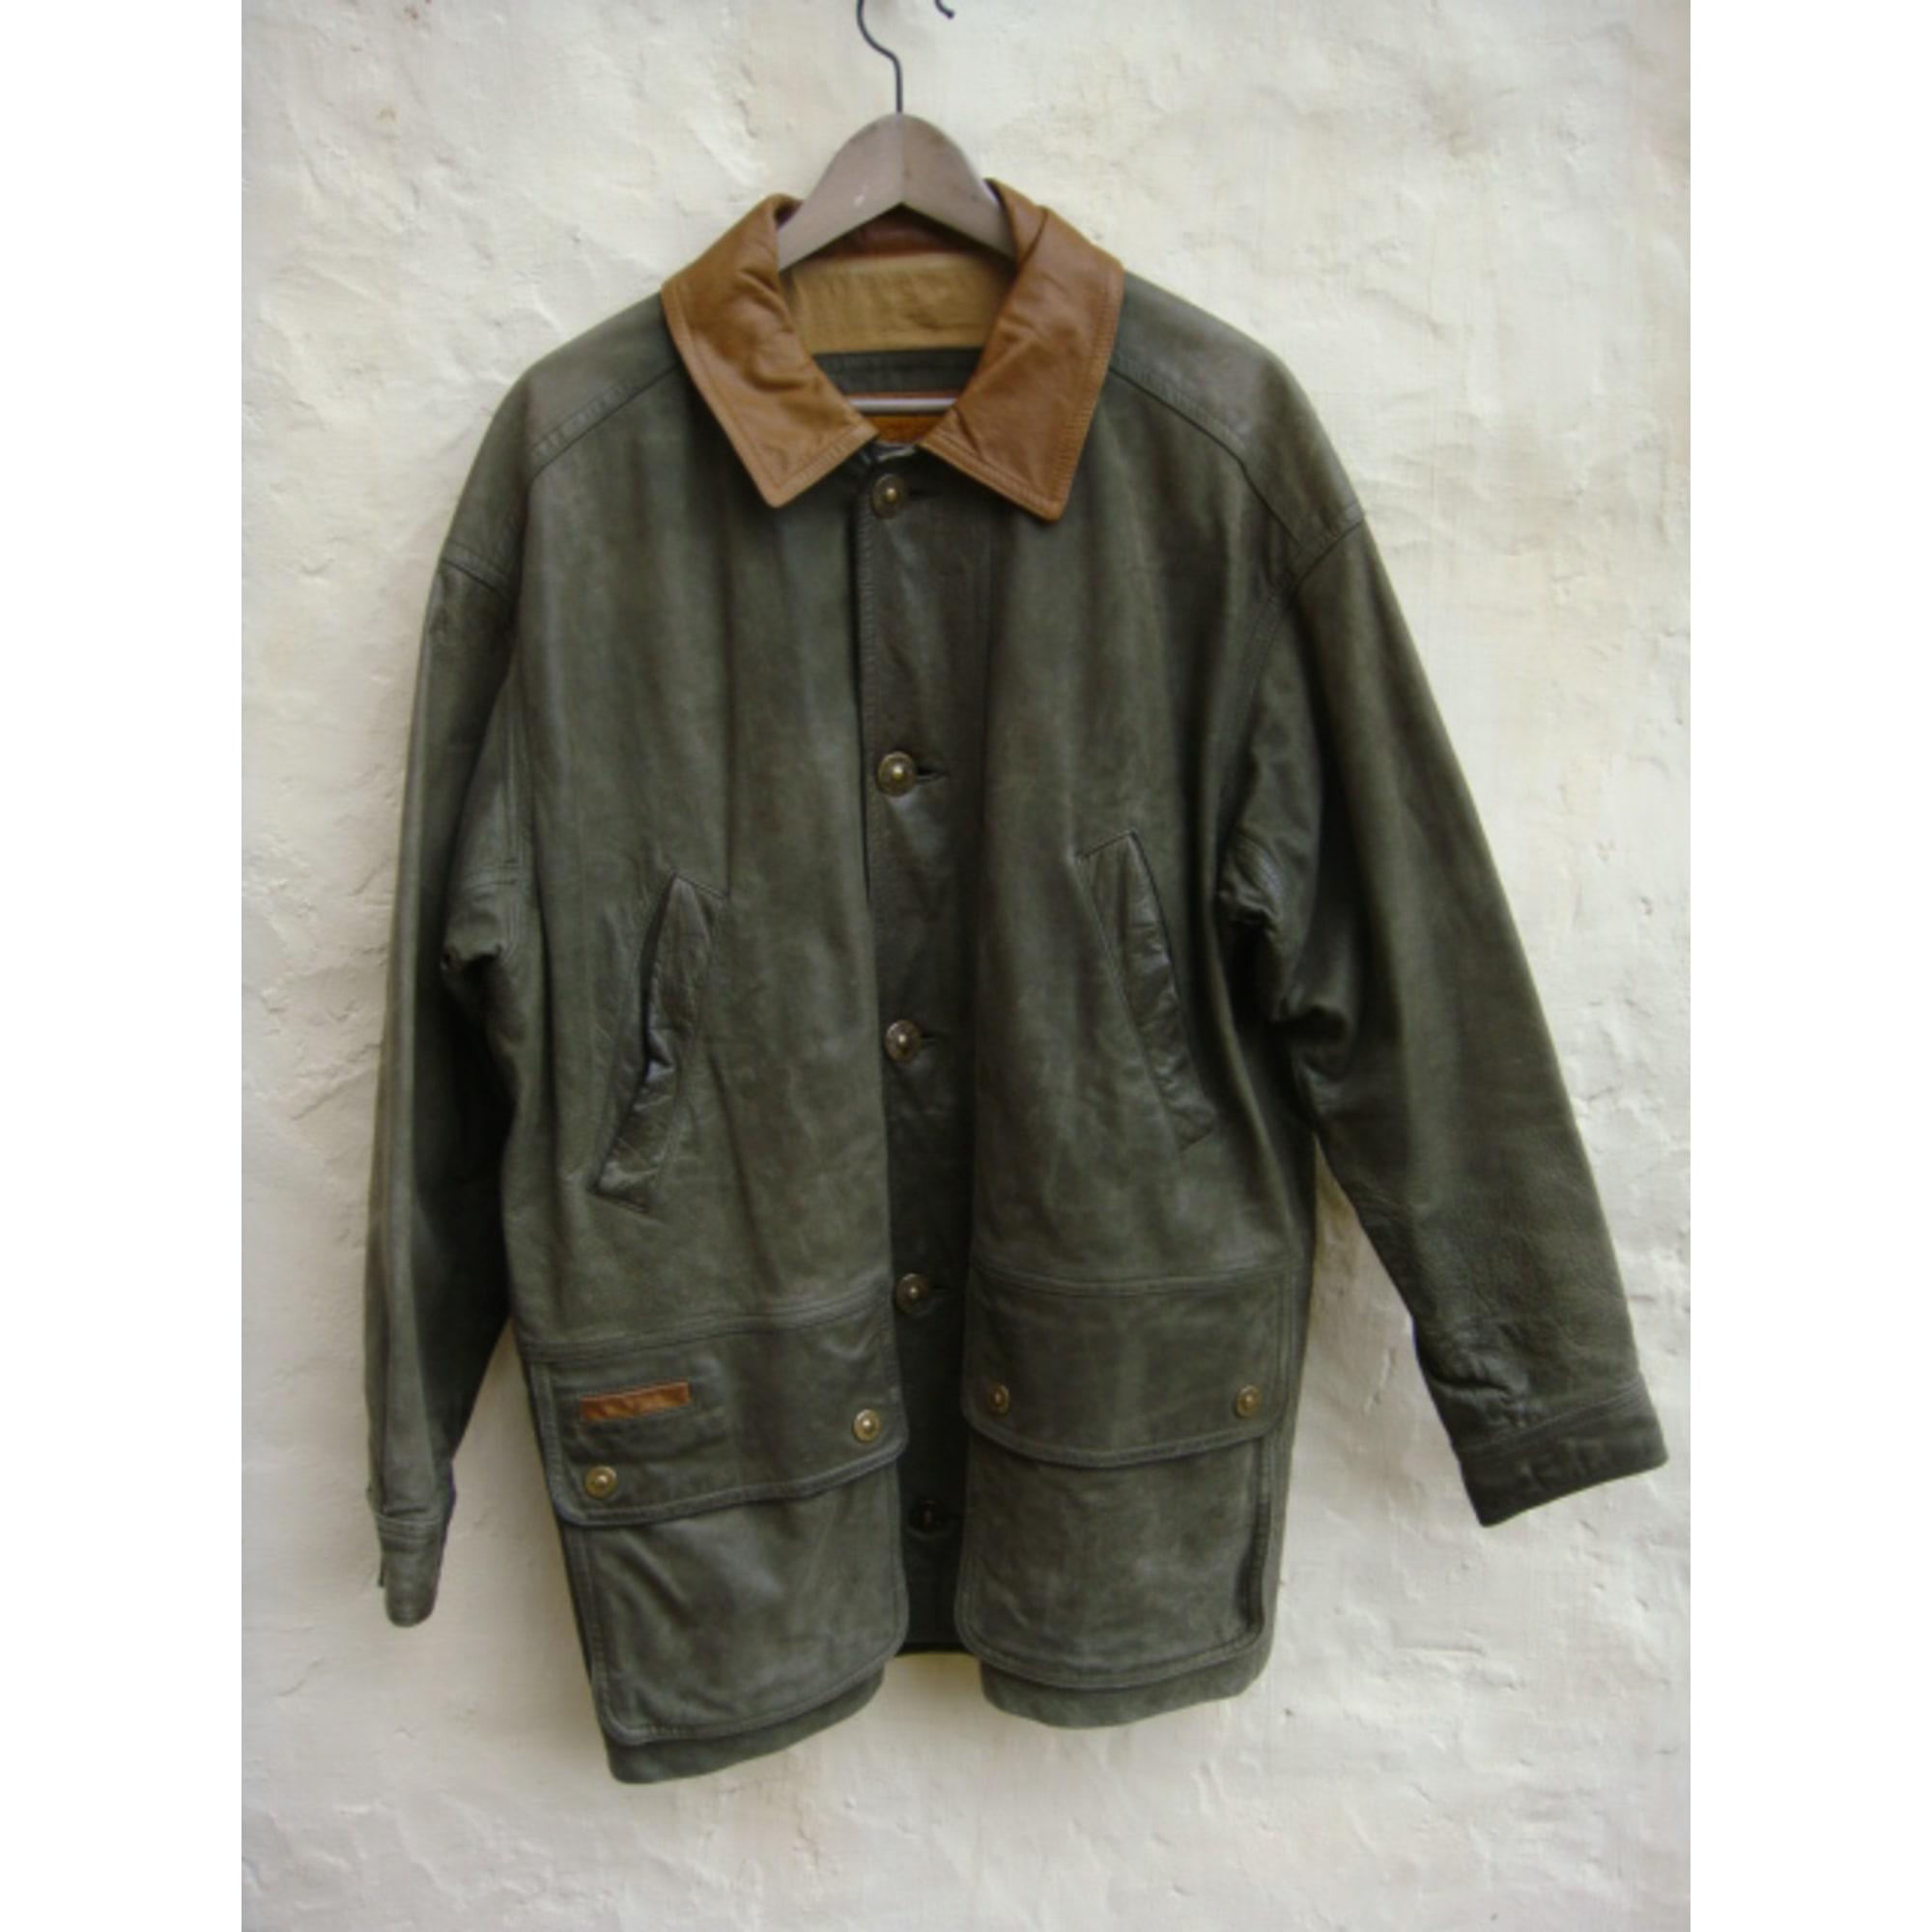 Timberland Veste Cuir Vert 1950526 40 En vOqxOwC1